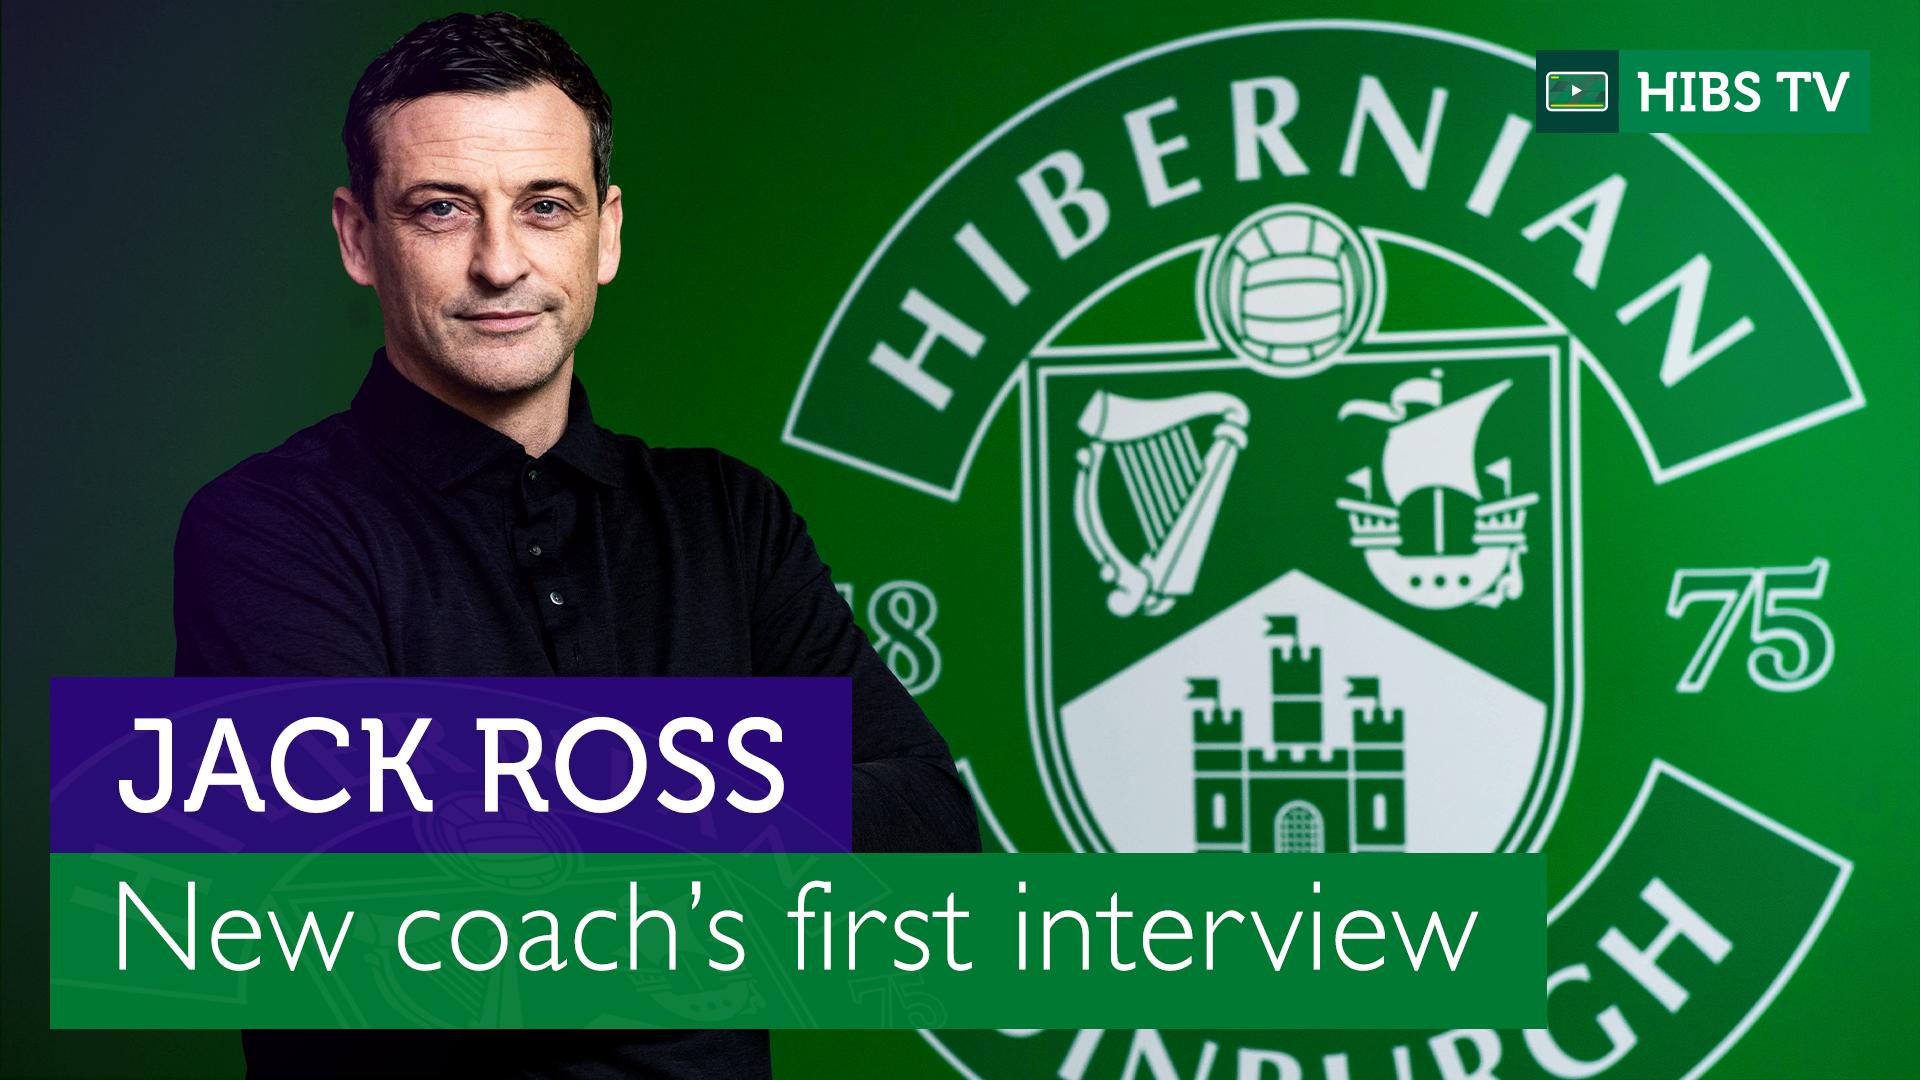 INTERVIEW | JACK ROSS